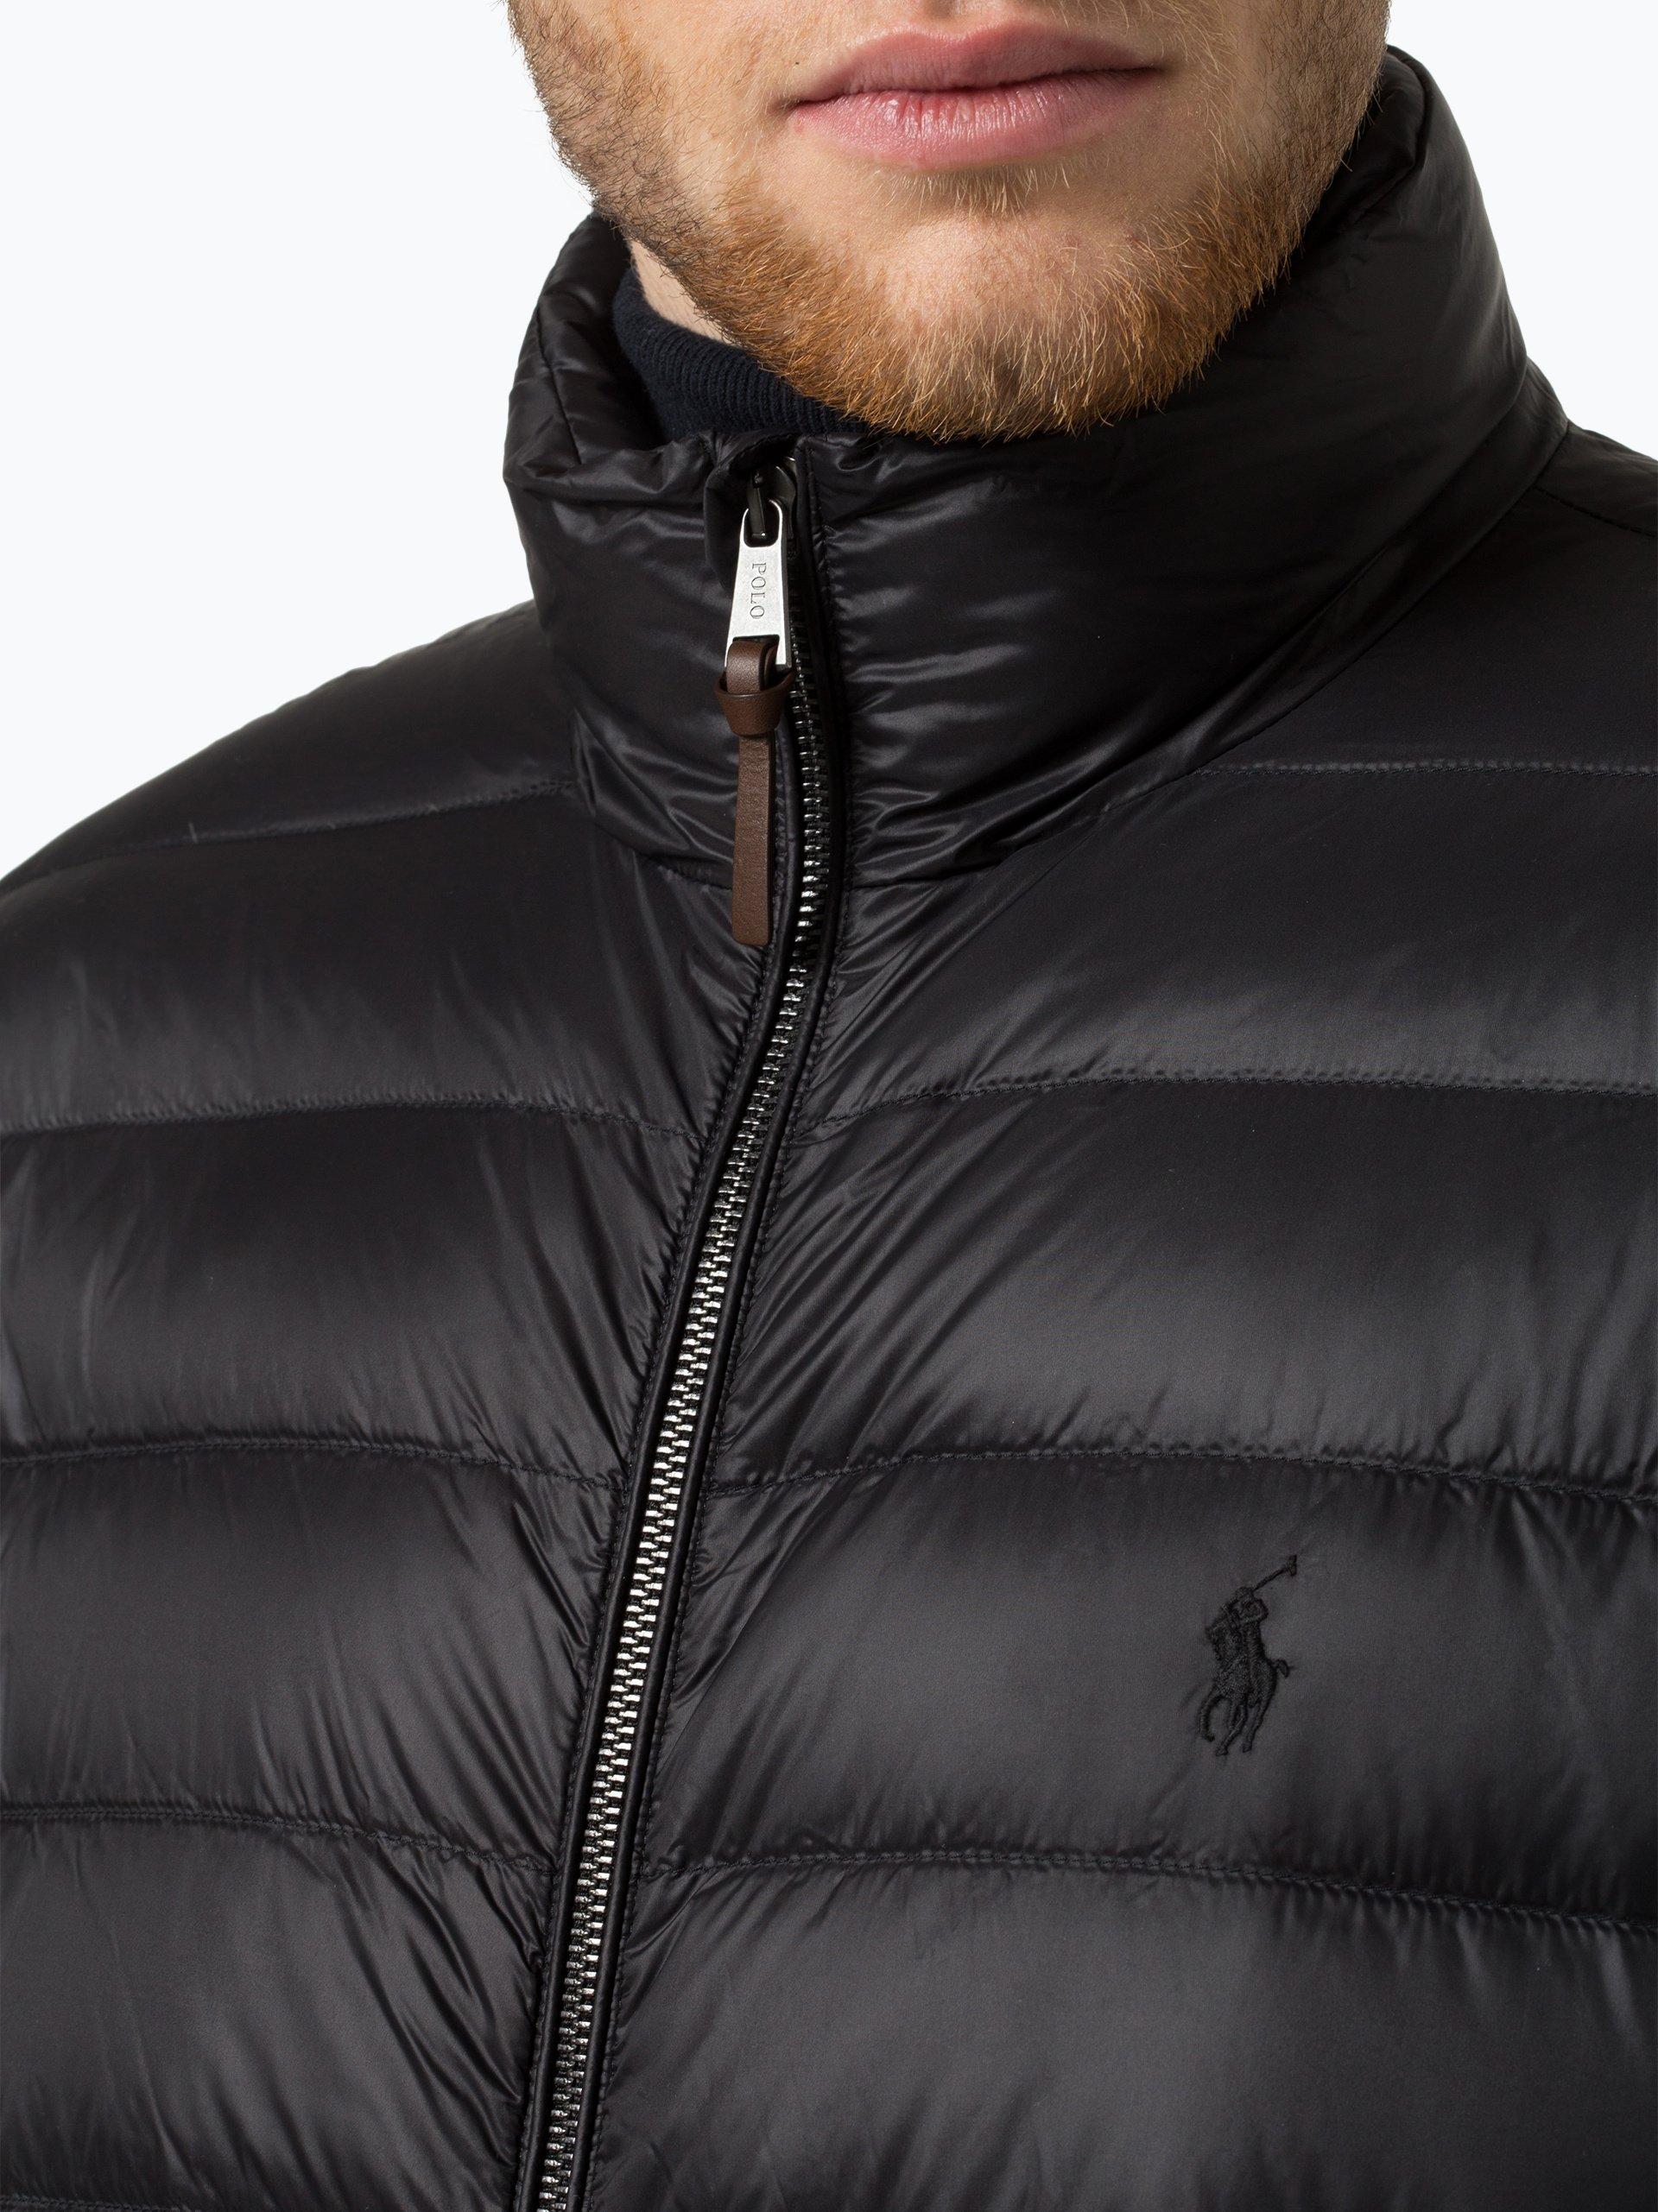 c31a0589d0644e Polo Ralph Lauren Herren Daunenjacke online kaufen